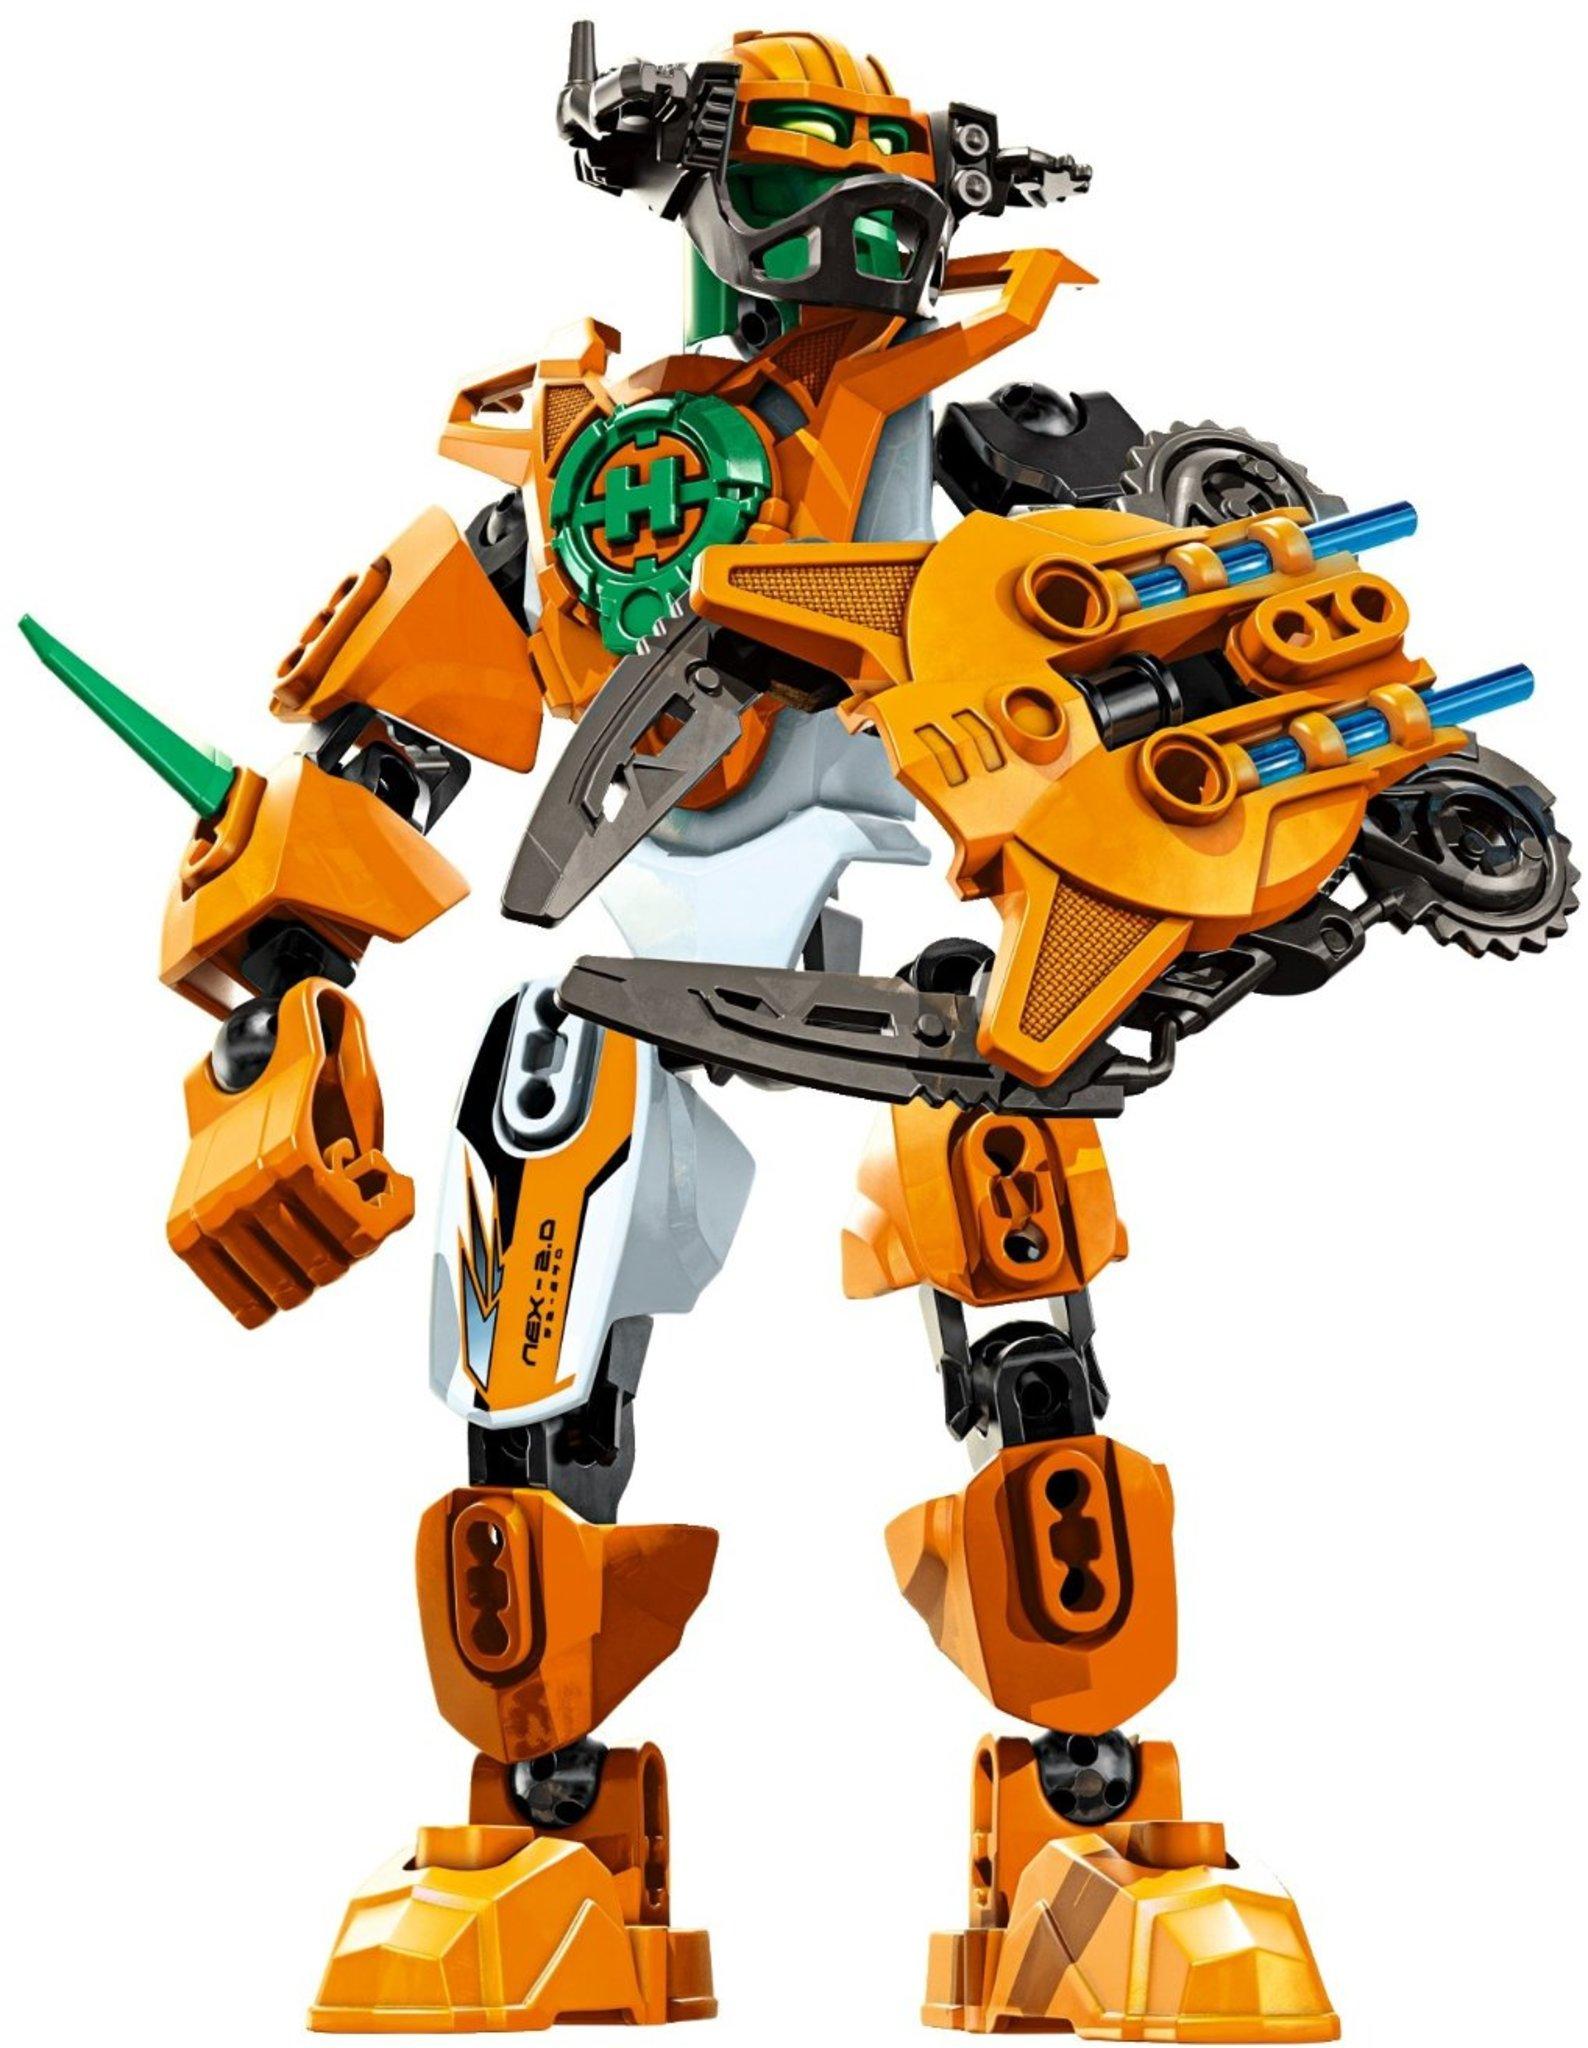 Lego Hero Factory 2068 Nex 20 Mattonito